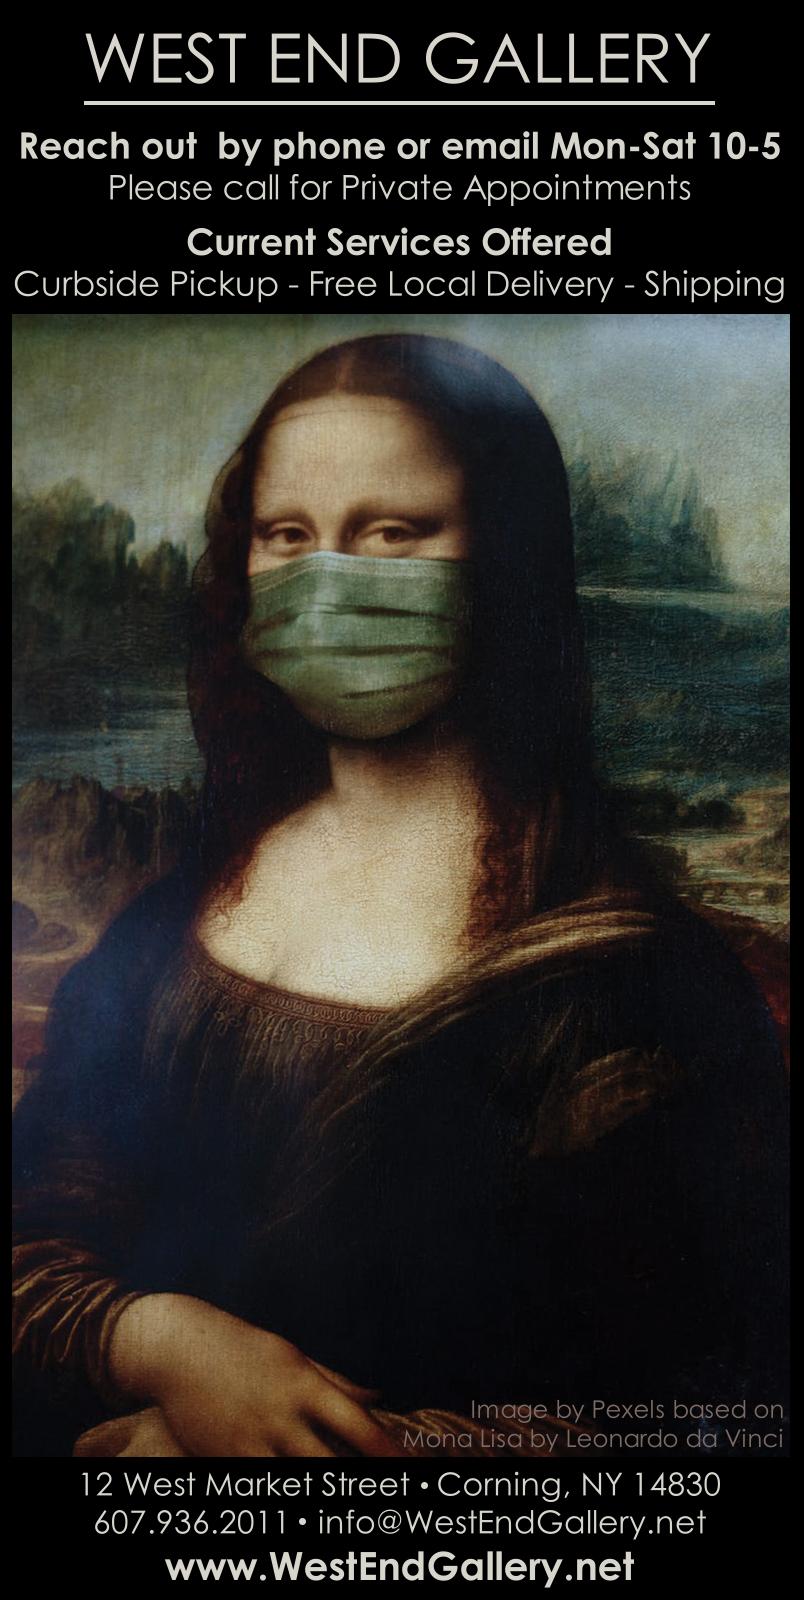 Mona Lisa image credit Pexels